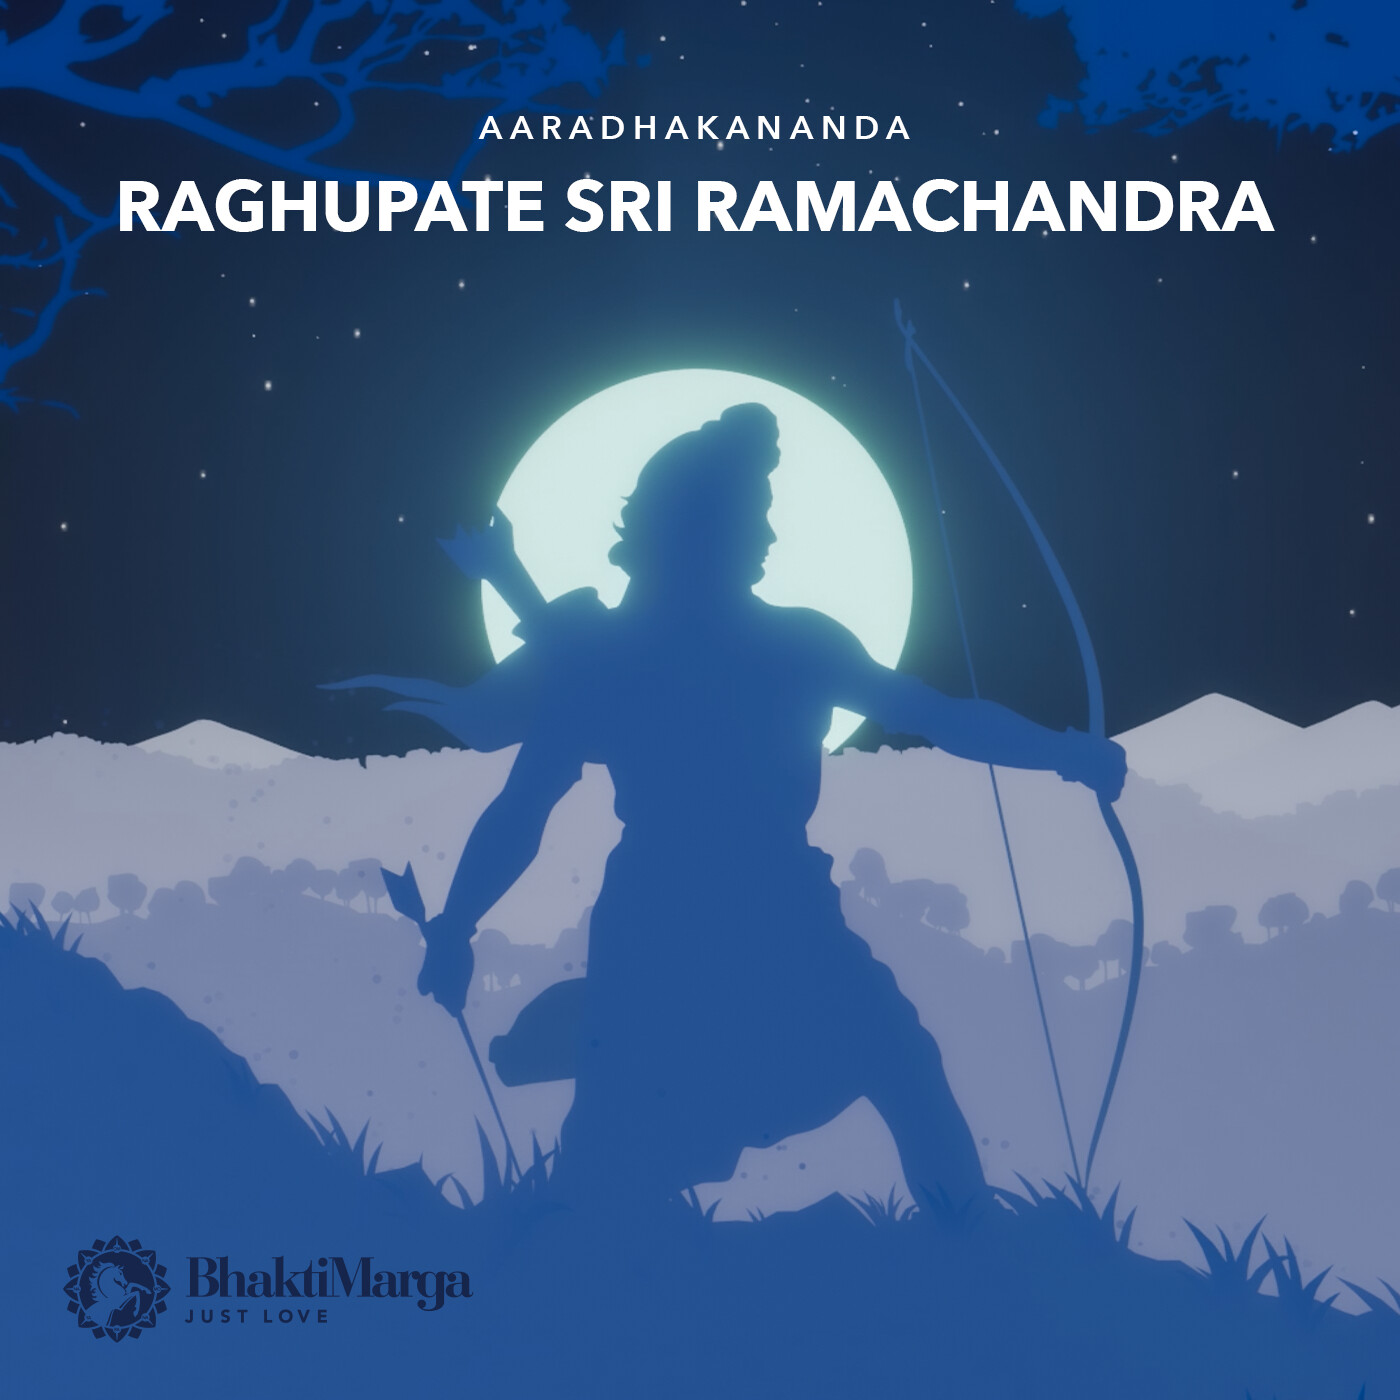 Raghupate Sri Ramachandra